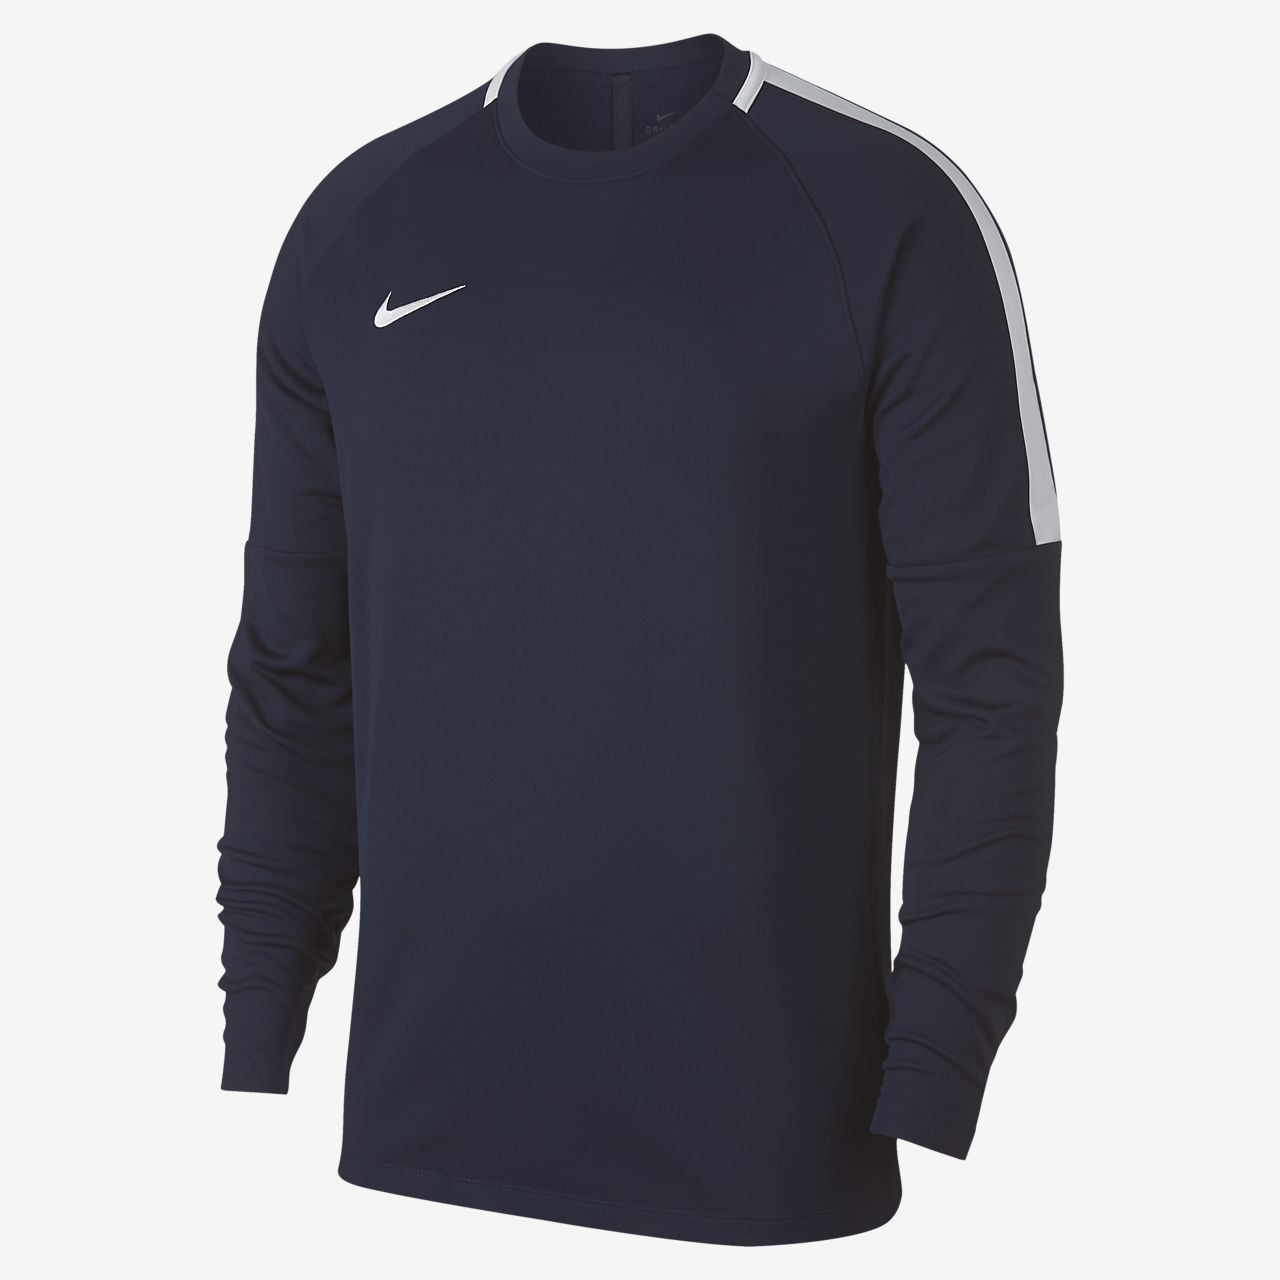 Hombre Fútbol Sudadera Fit Chándal Nike Es Academy De Dri q0TP0Hx